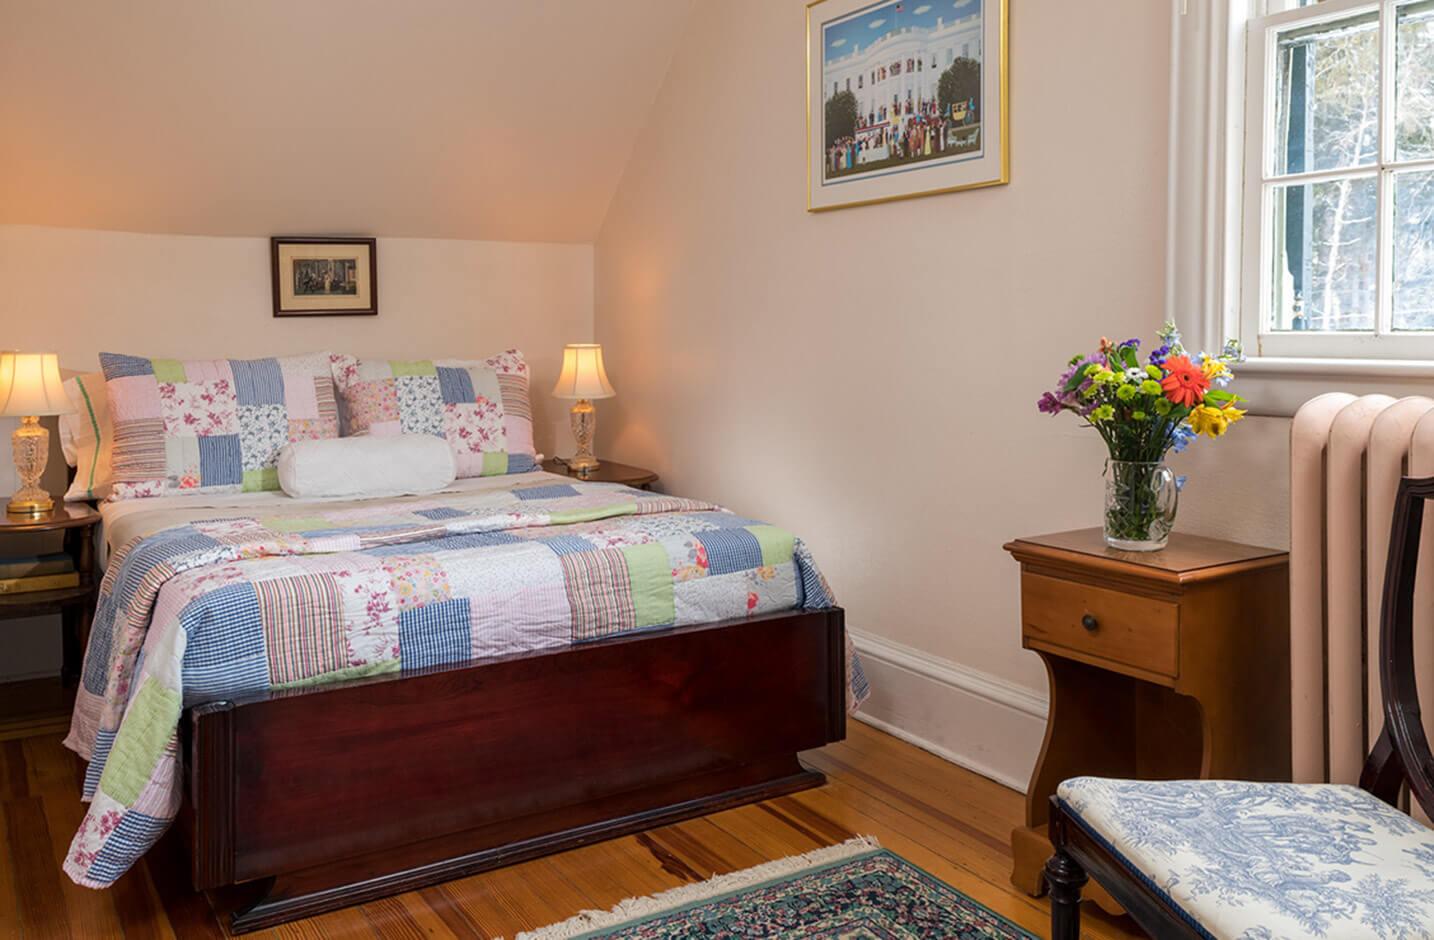 Bed and Breakfast in Watkins Glen, NY - Room 3 bed